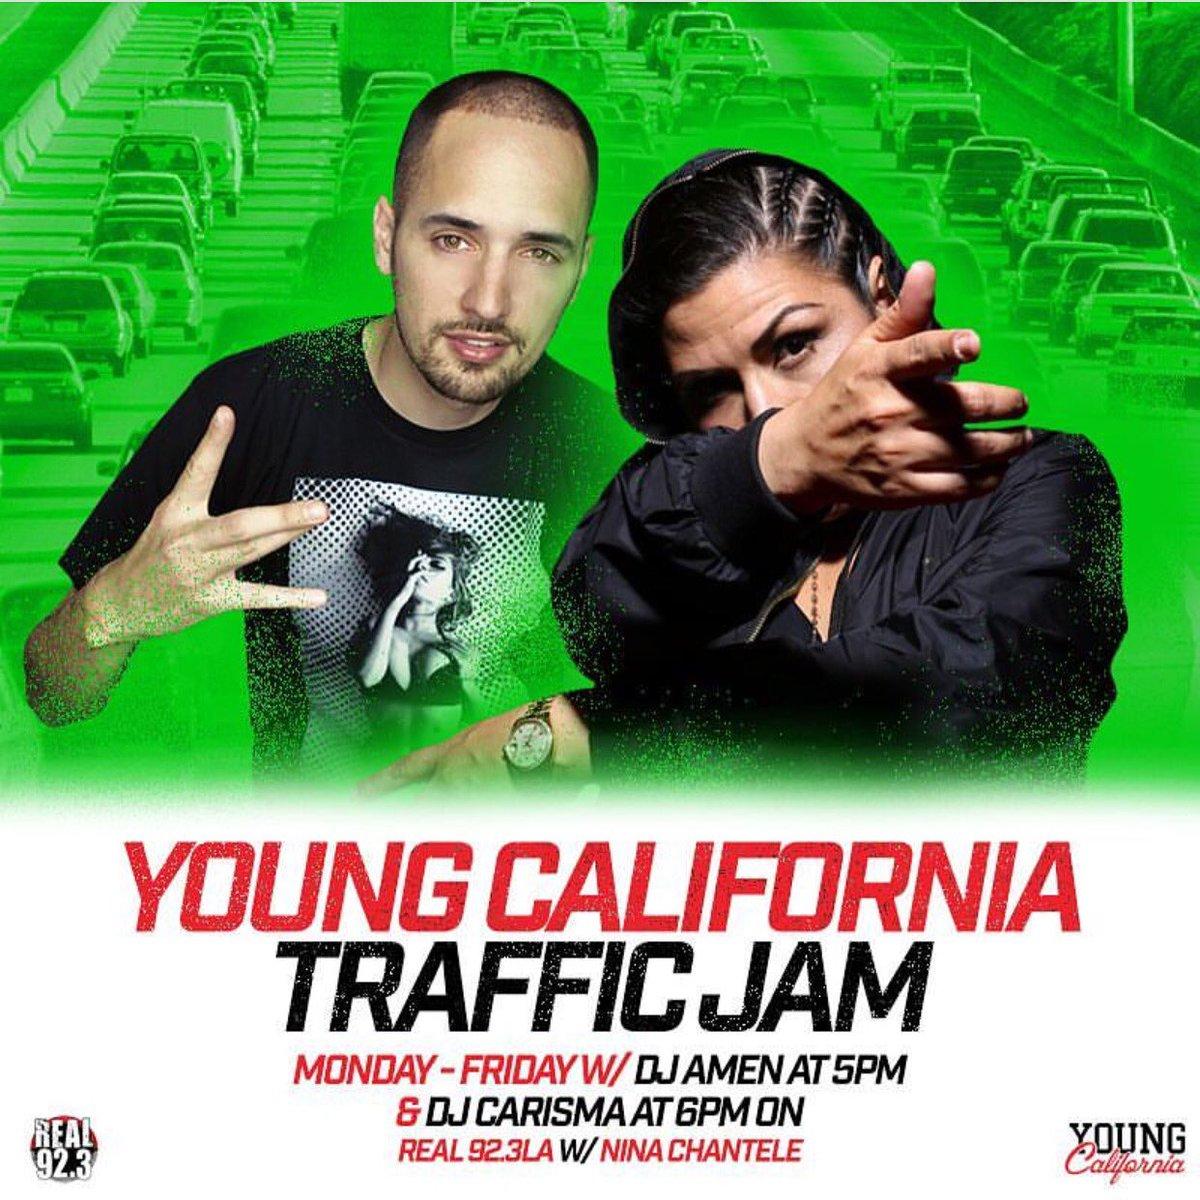 REAL 923 LA On Twitter The YoungCalifornia Traffic Jam Is Your Radios Turn Us Up LISTEN Tco IdGEHl4vIg